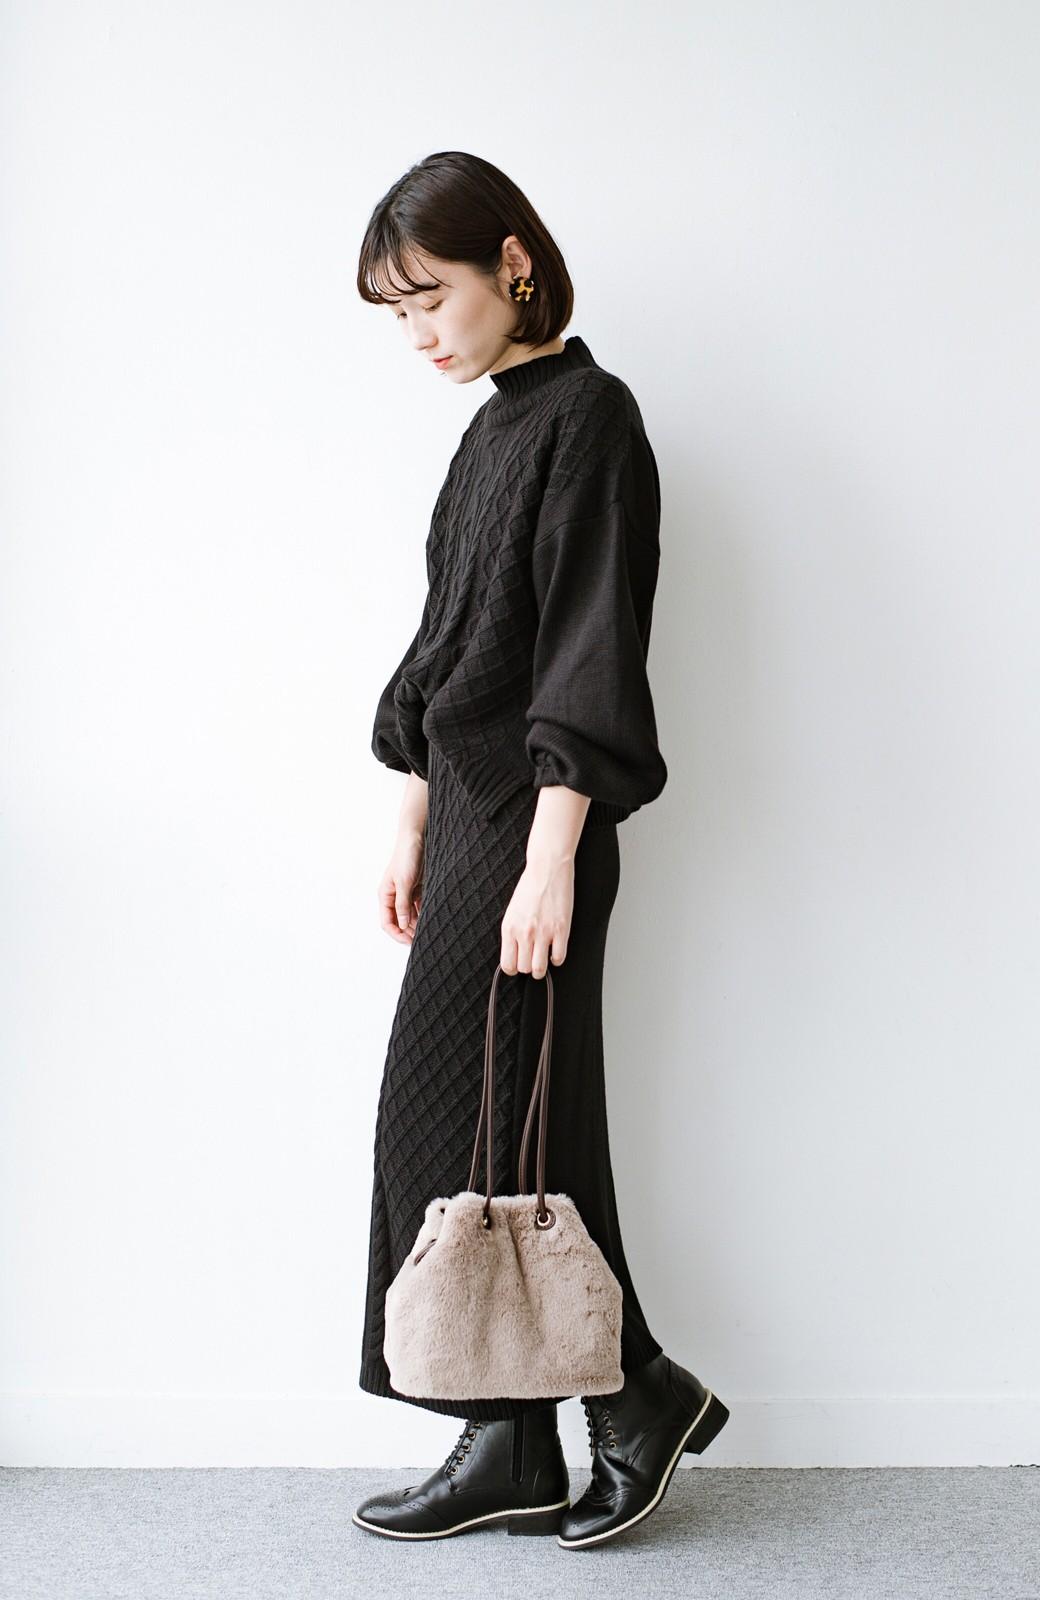 haco! さっと持って気分が上がる ふわっとかわいいエコファー巾着バッグ <グレイッシュベージュ>の商品写真13